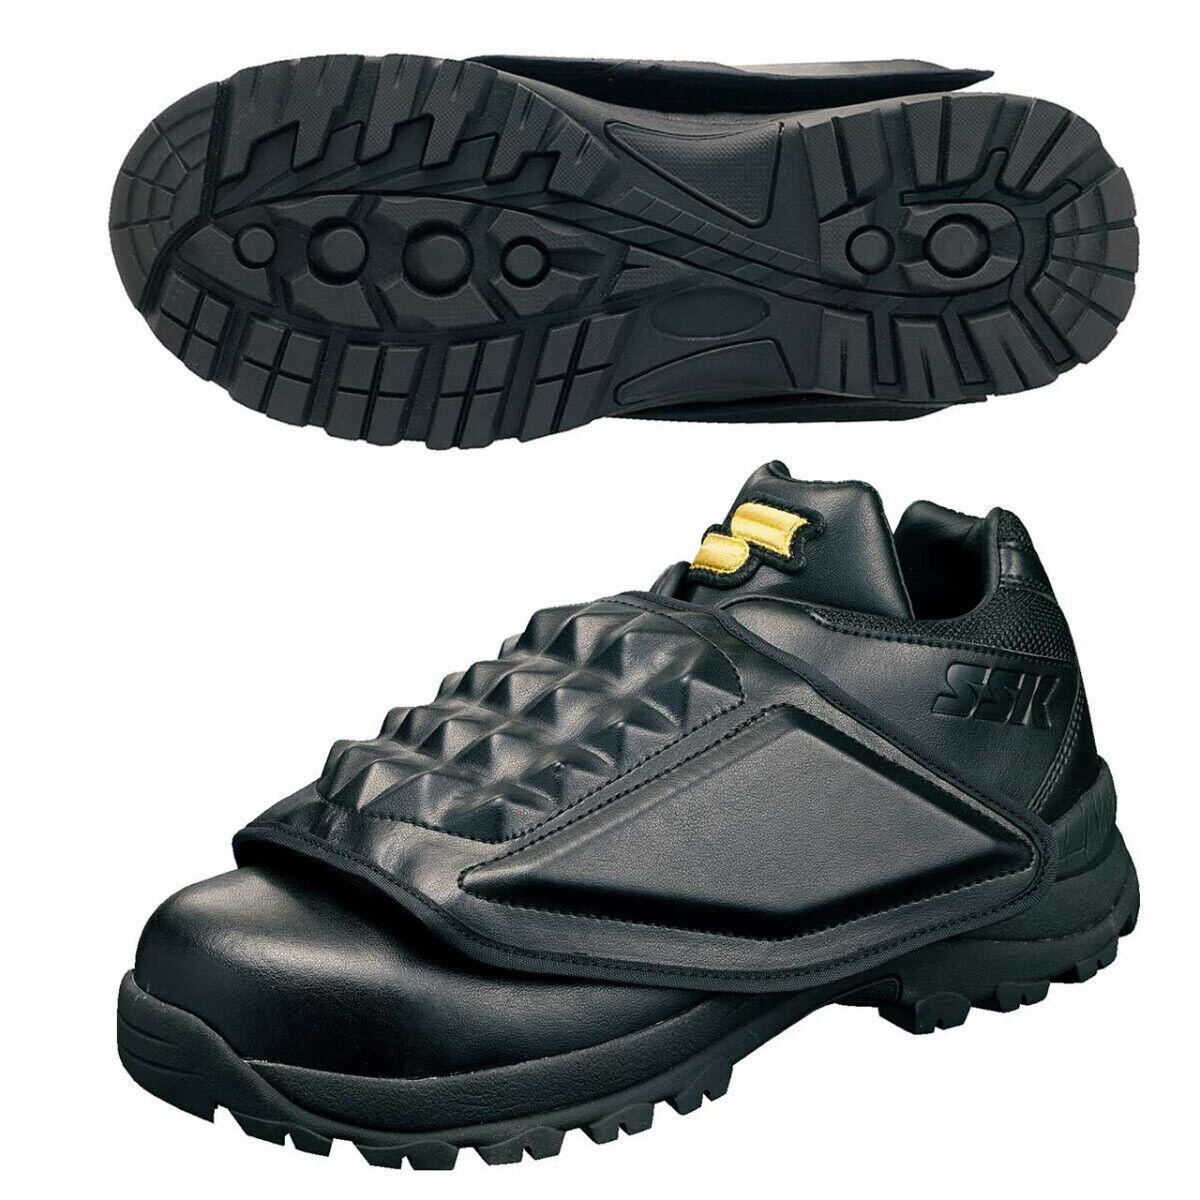 SSK Japón béisbol árbitro Zapatos Pro Modelo Boa SSF8000 Negro